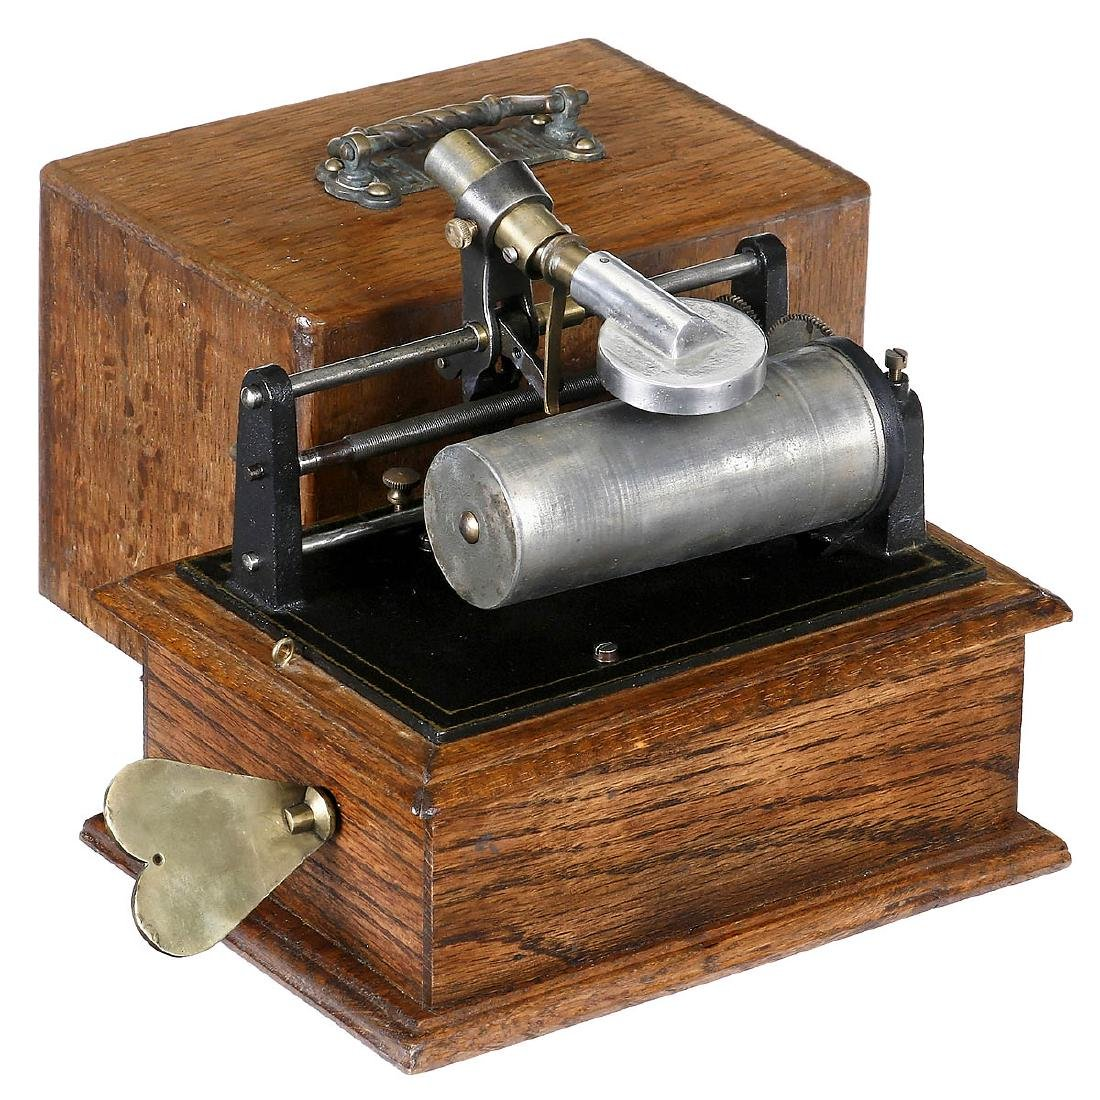 2 Cylinder Phonographs, c. 1900